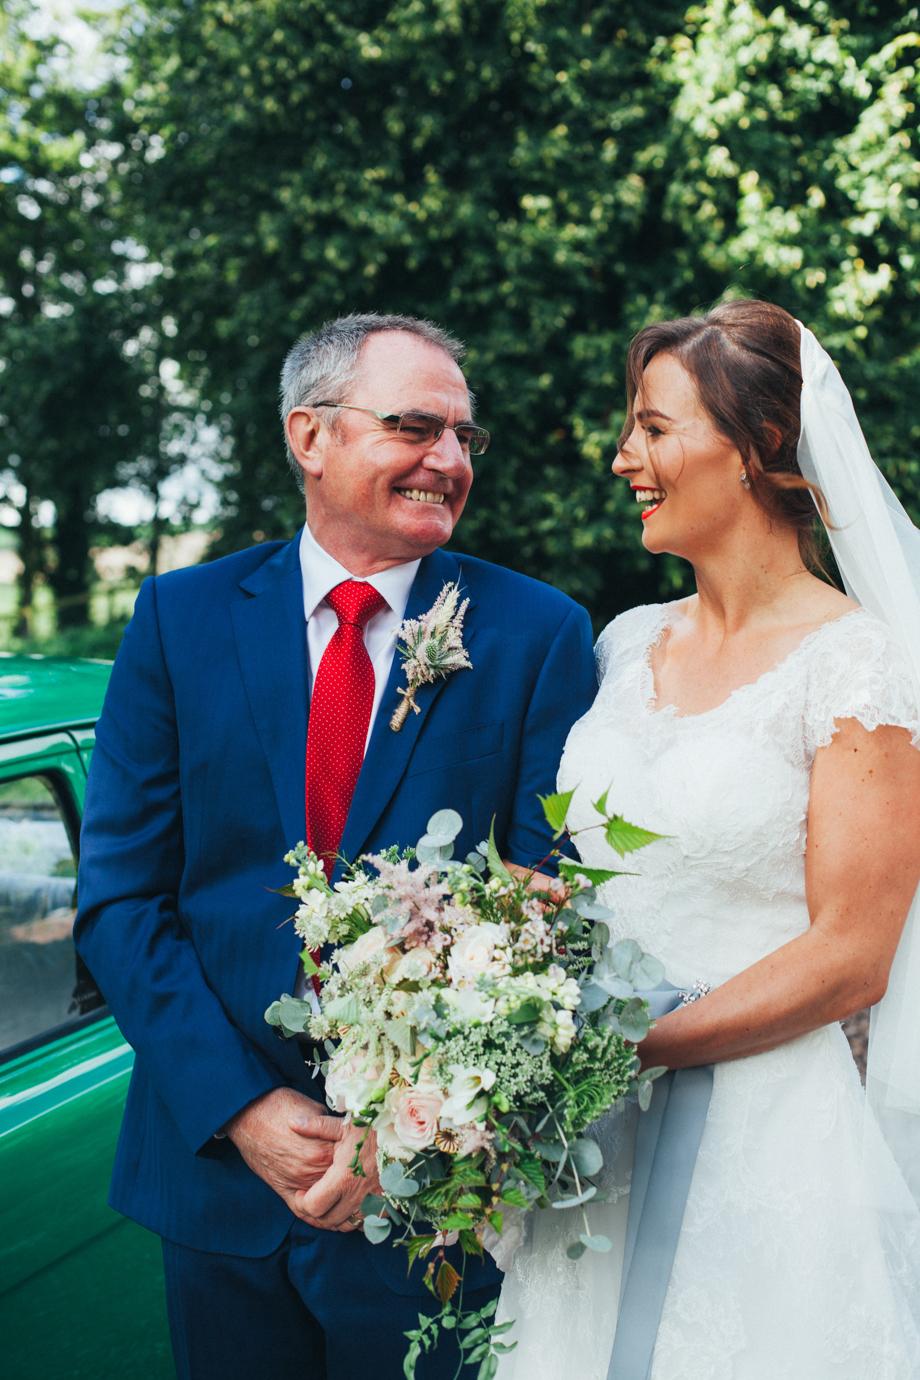 Shropshire-Festival-Wedding-21